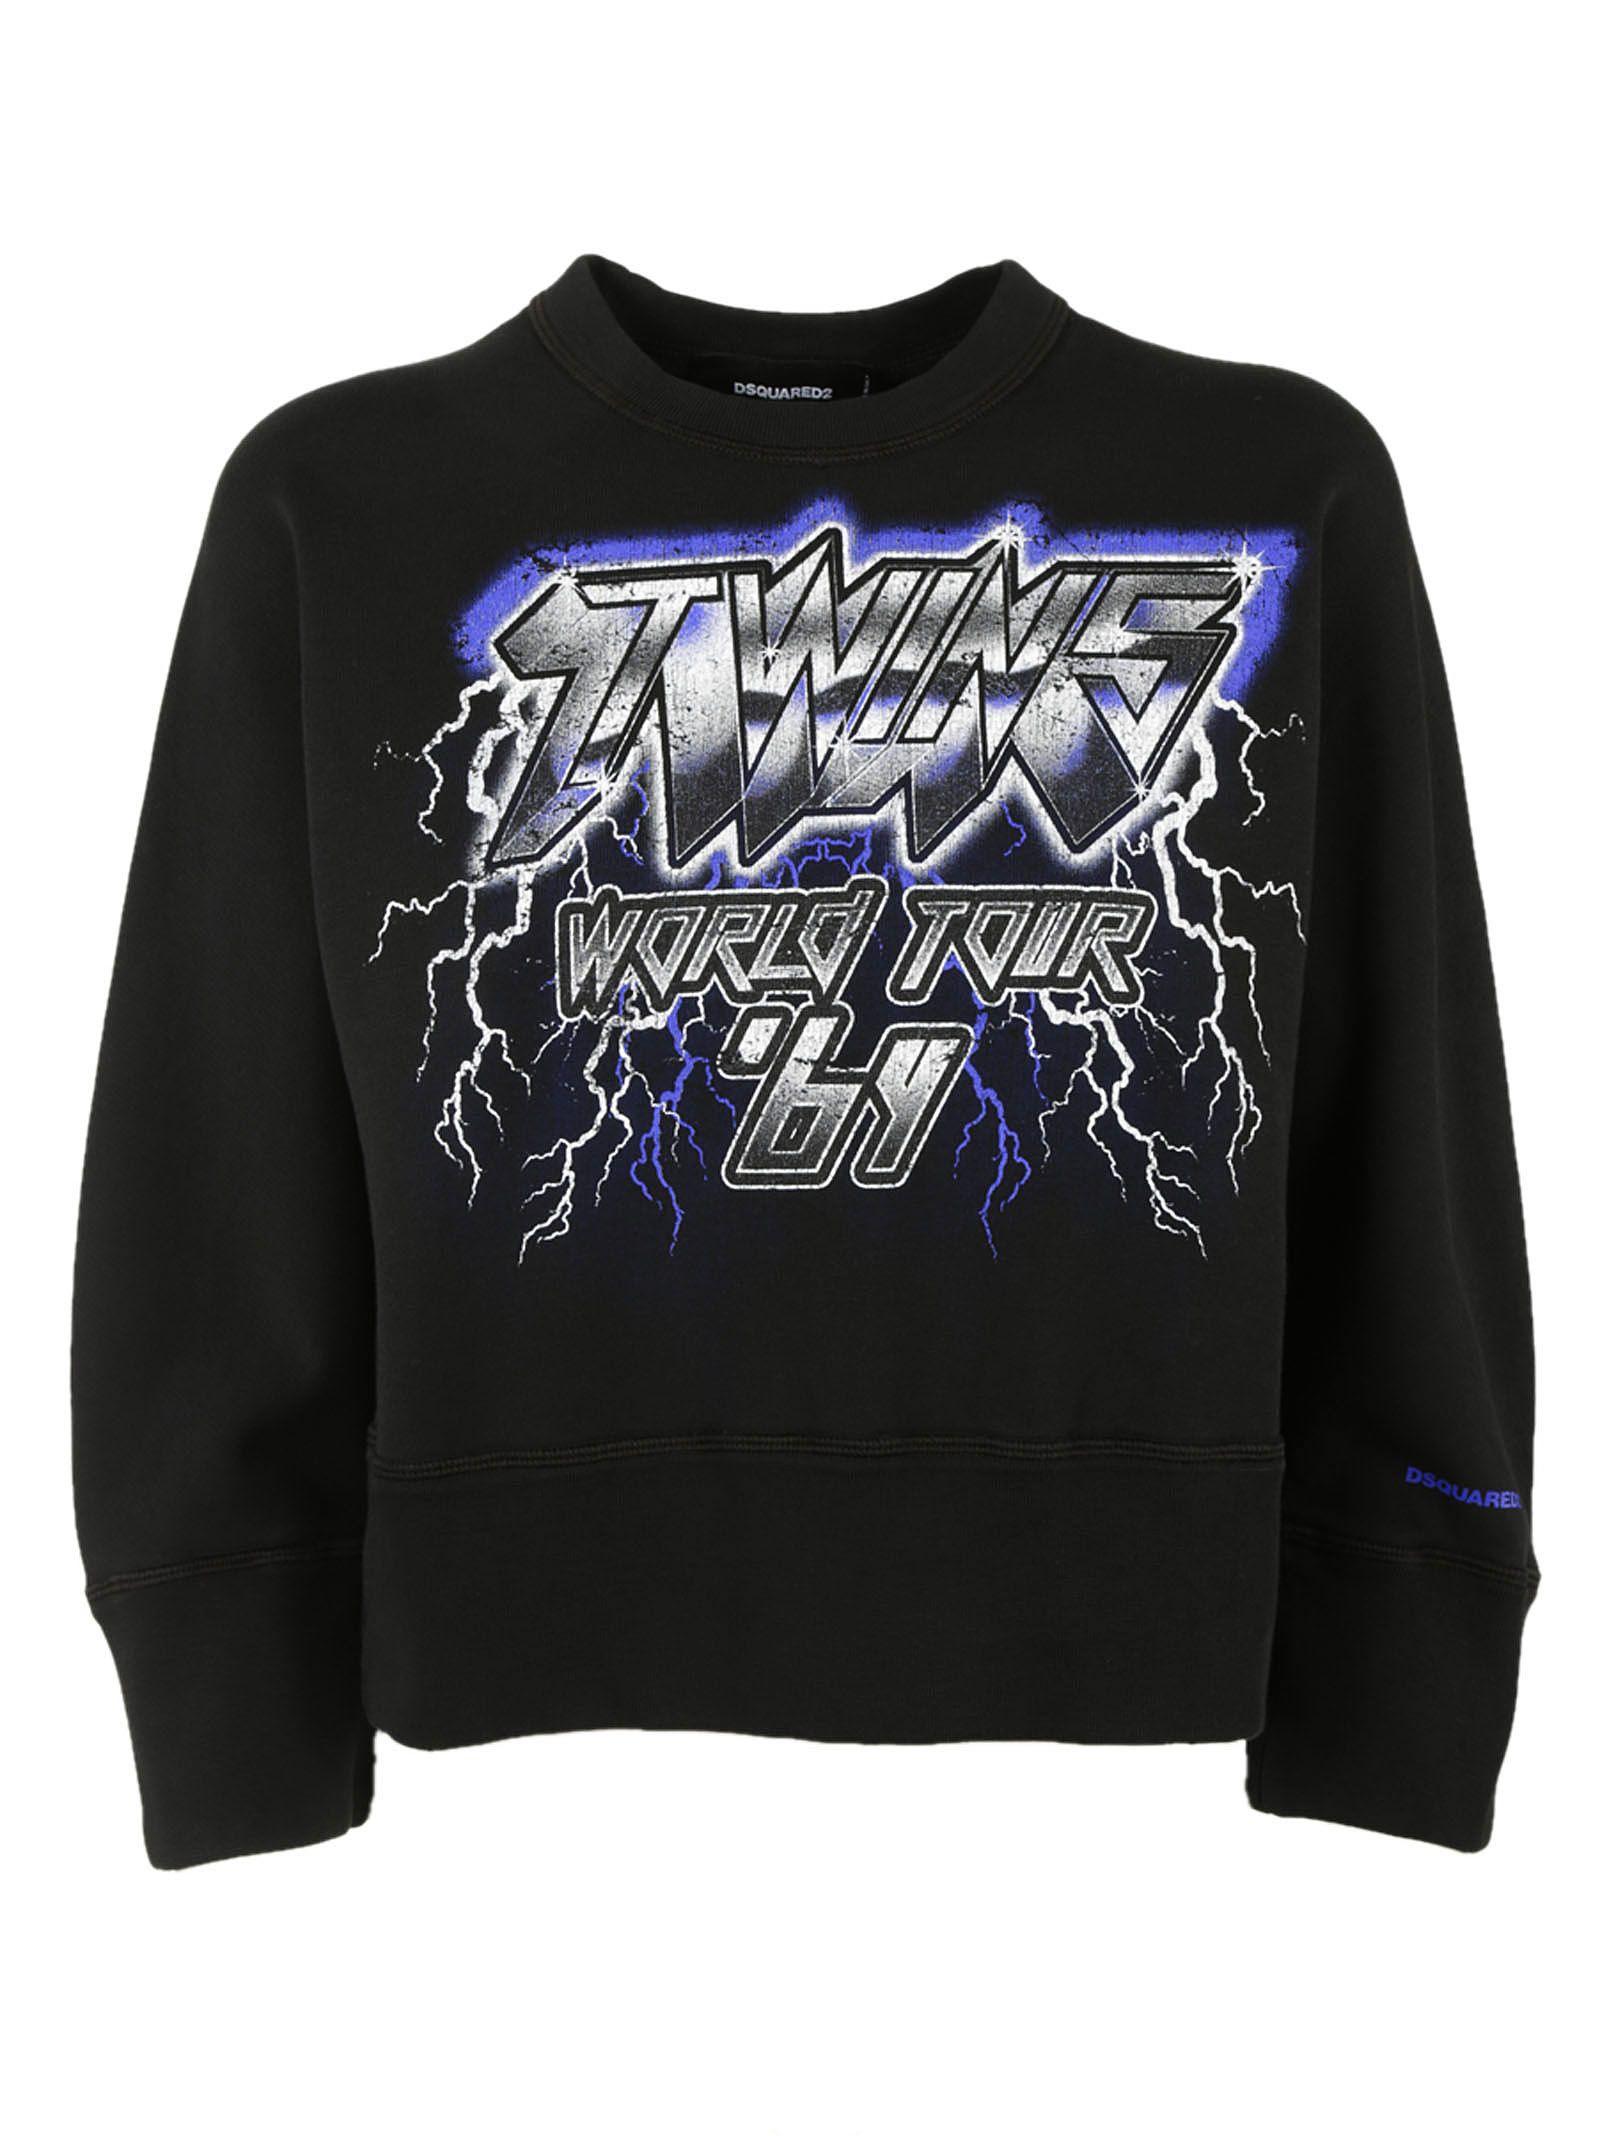 Dsquared2 Twins World Tour Sweatshirt